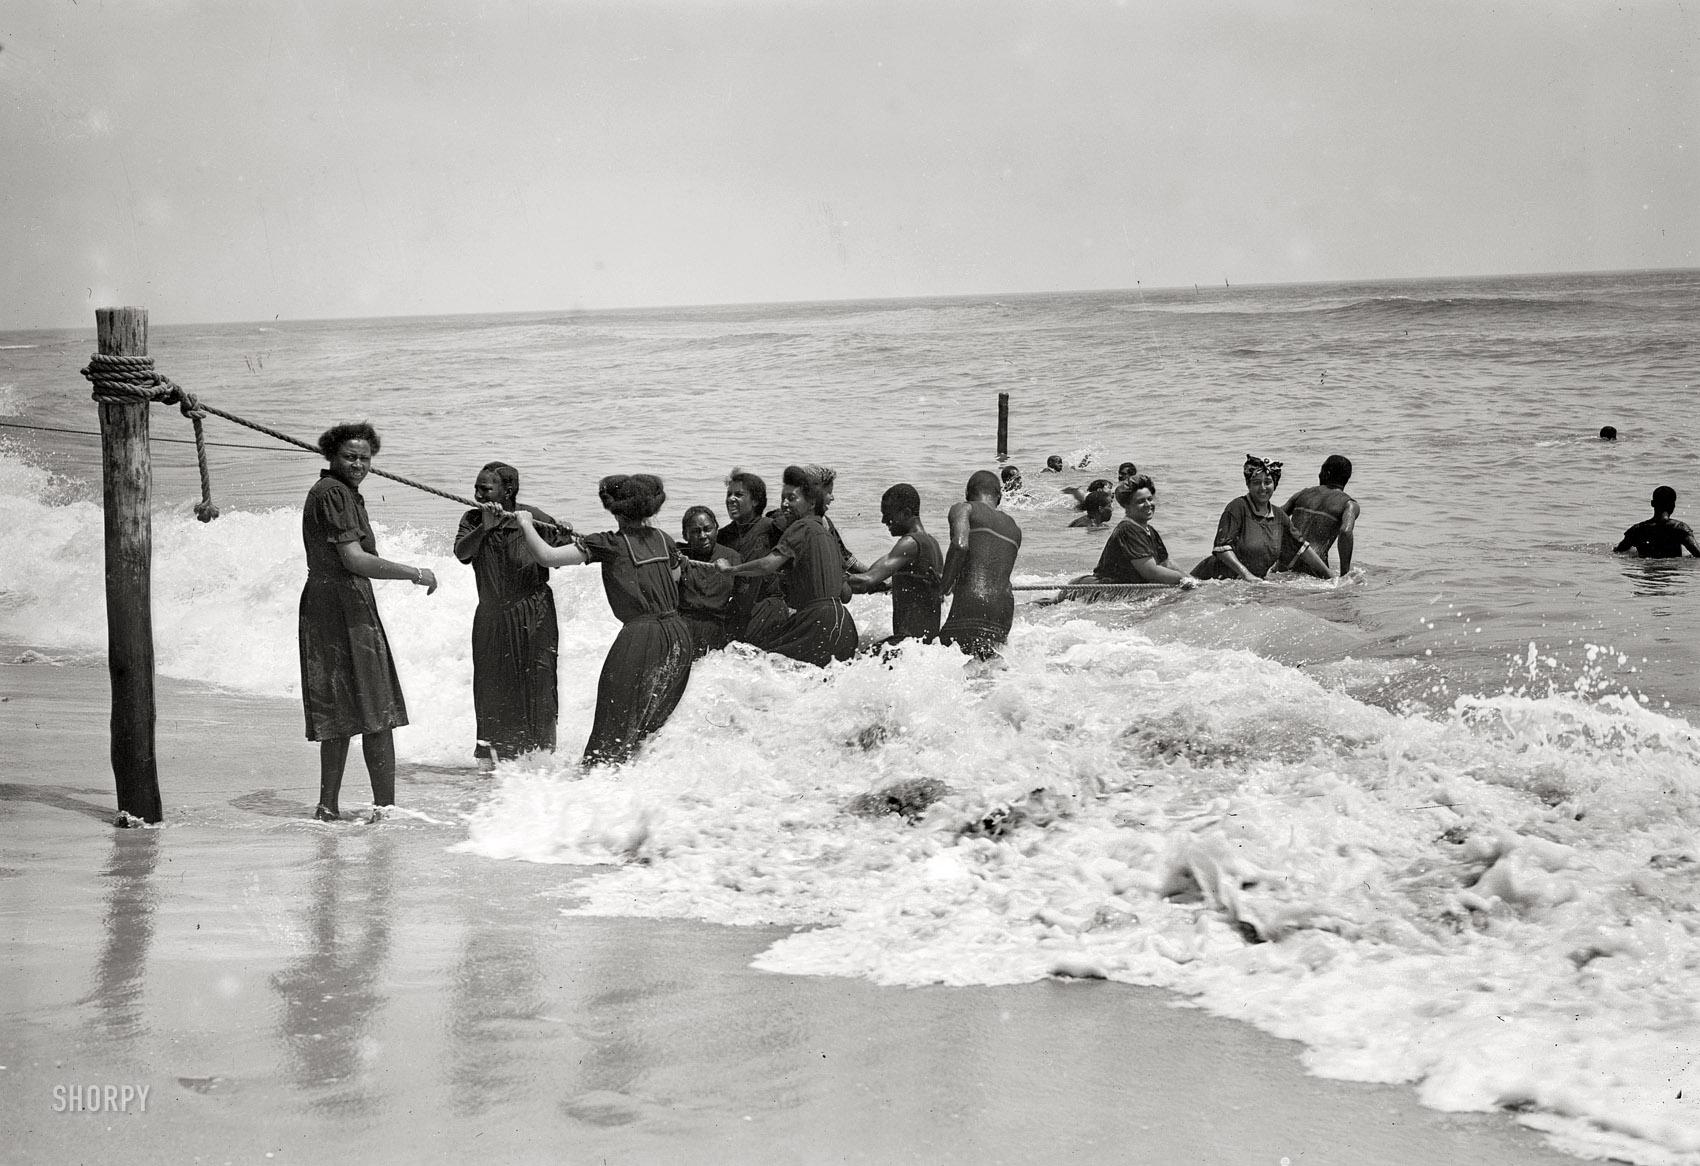 Negro bathers, Asbury Park